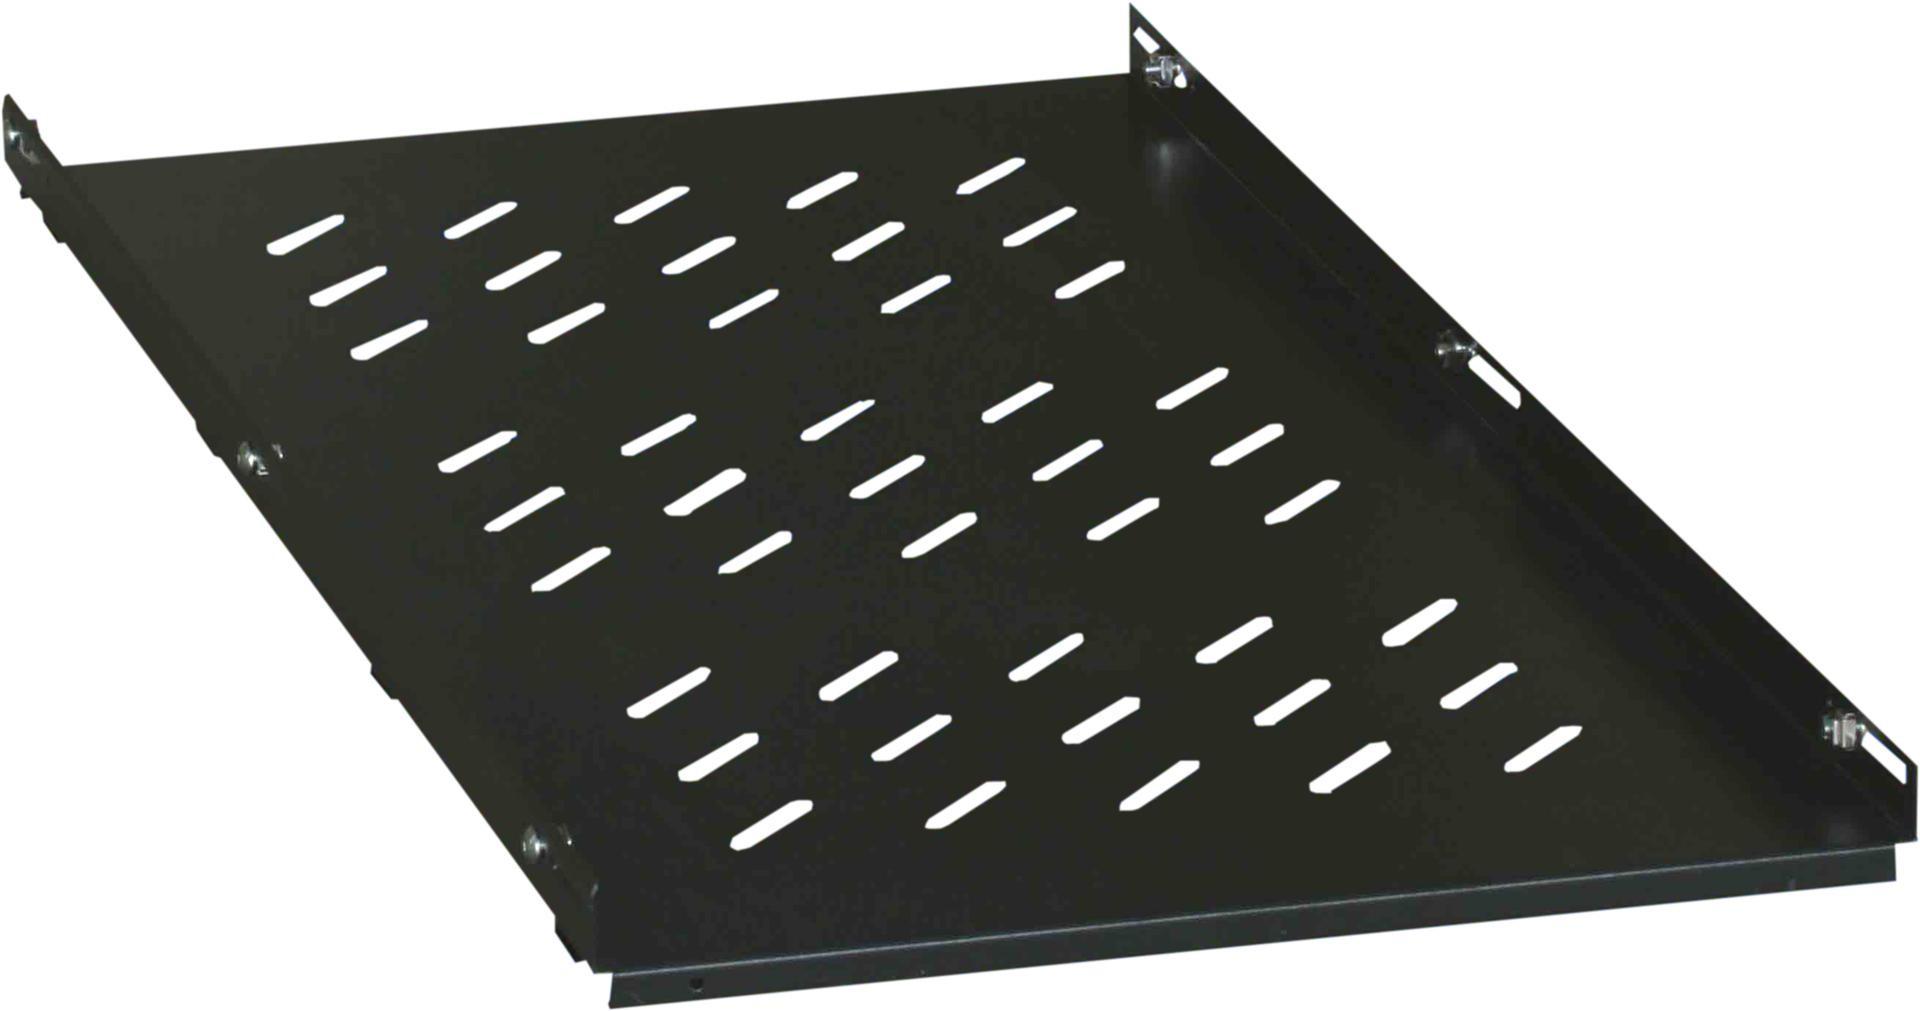 Verstärkter Fachboden geeignet für 600x1200mm oder 800x1200mm Serverschränke